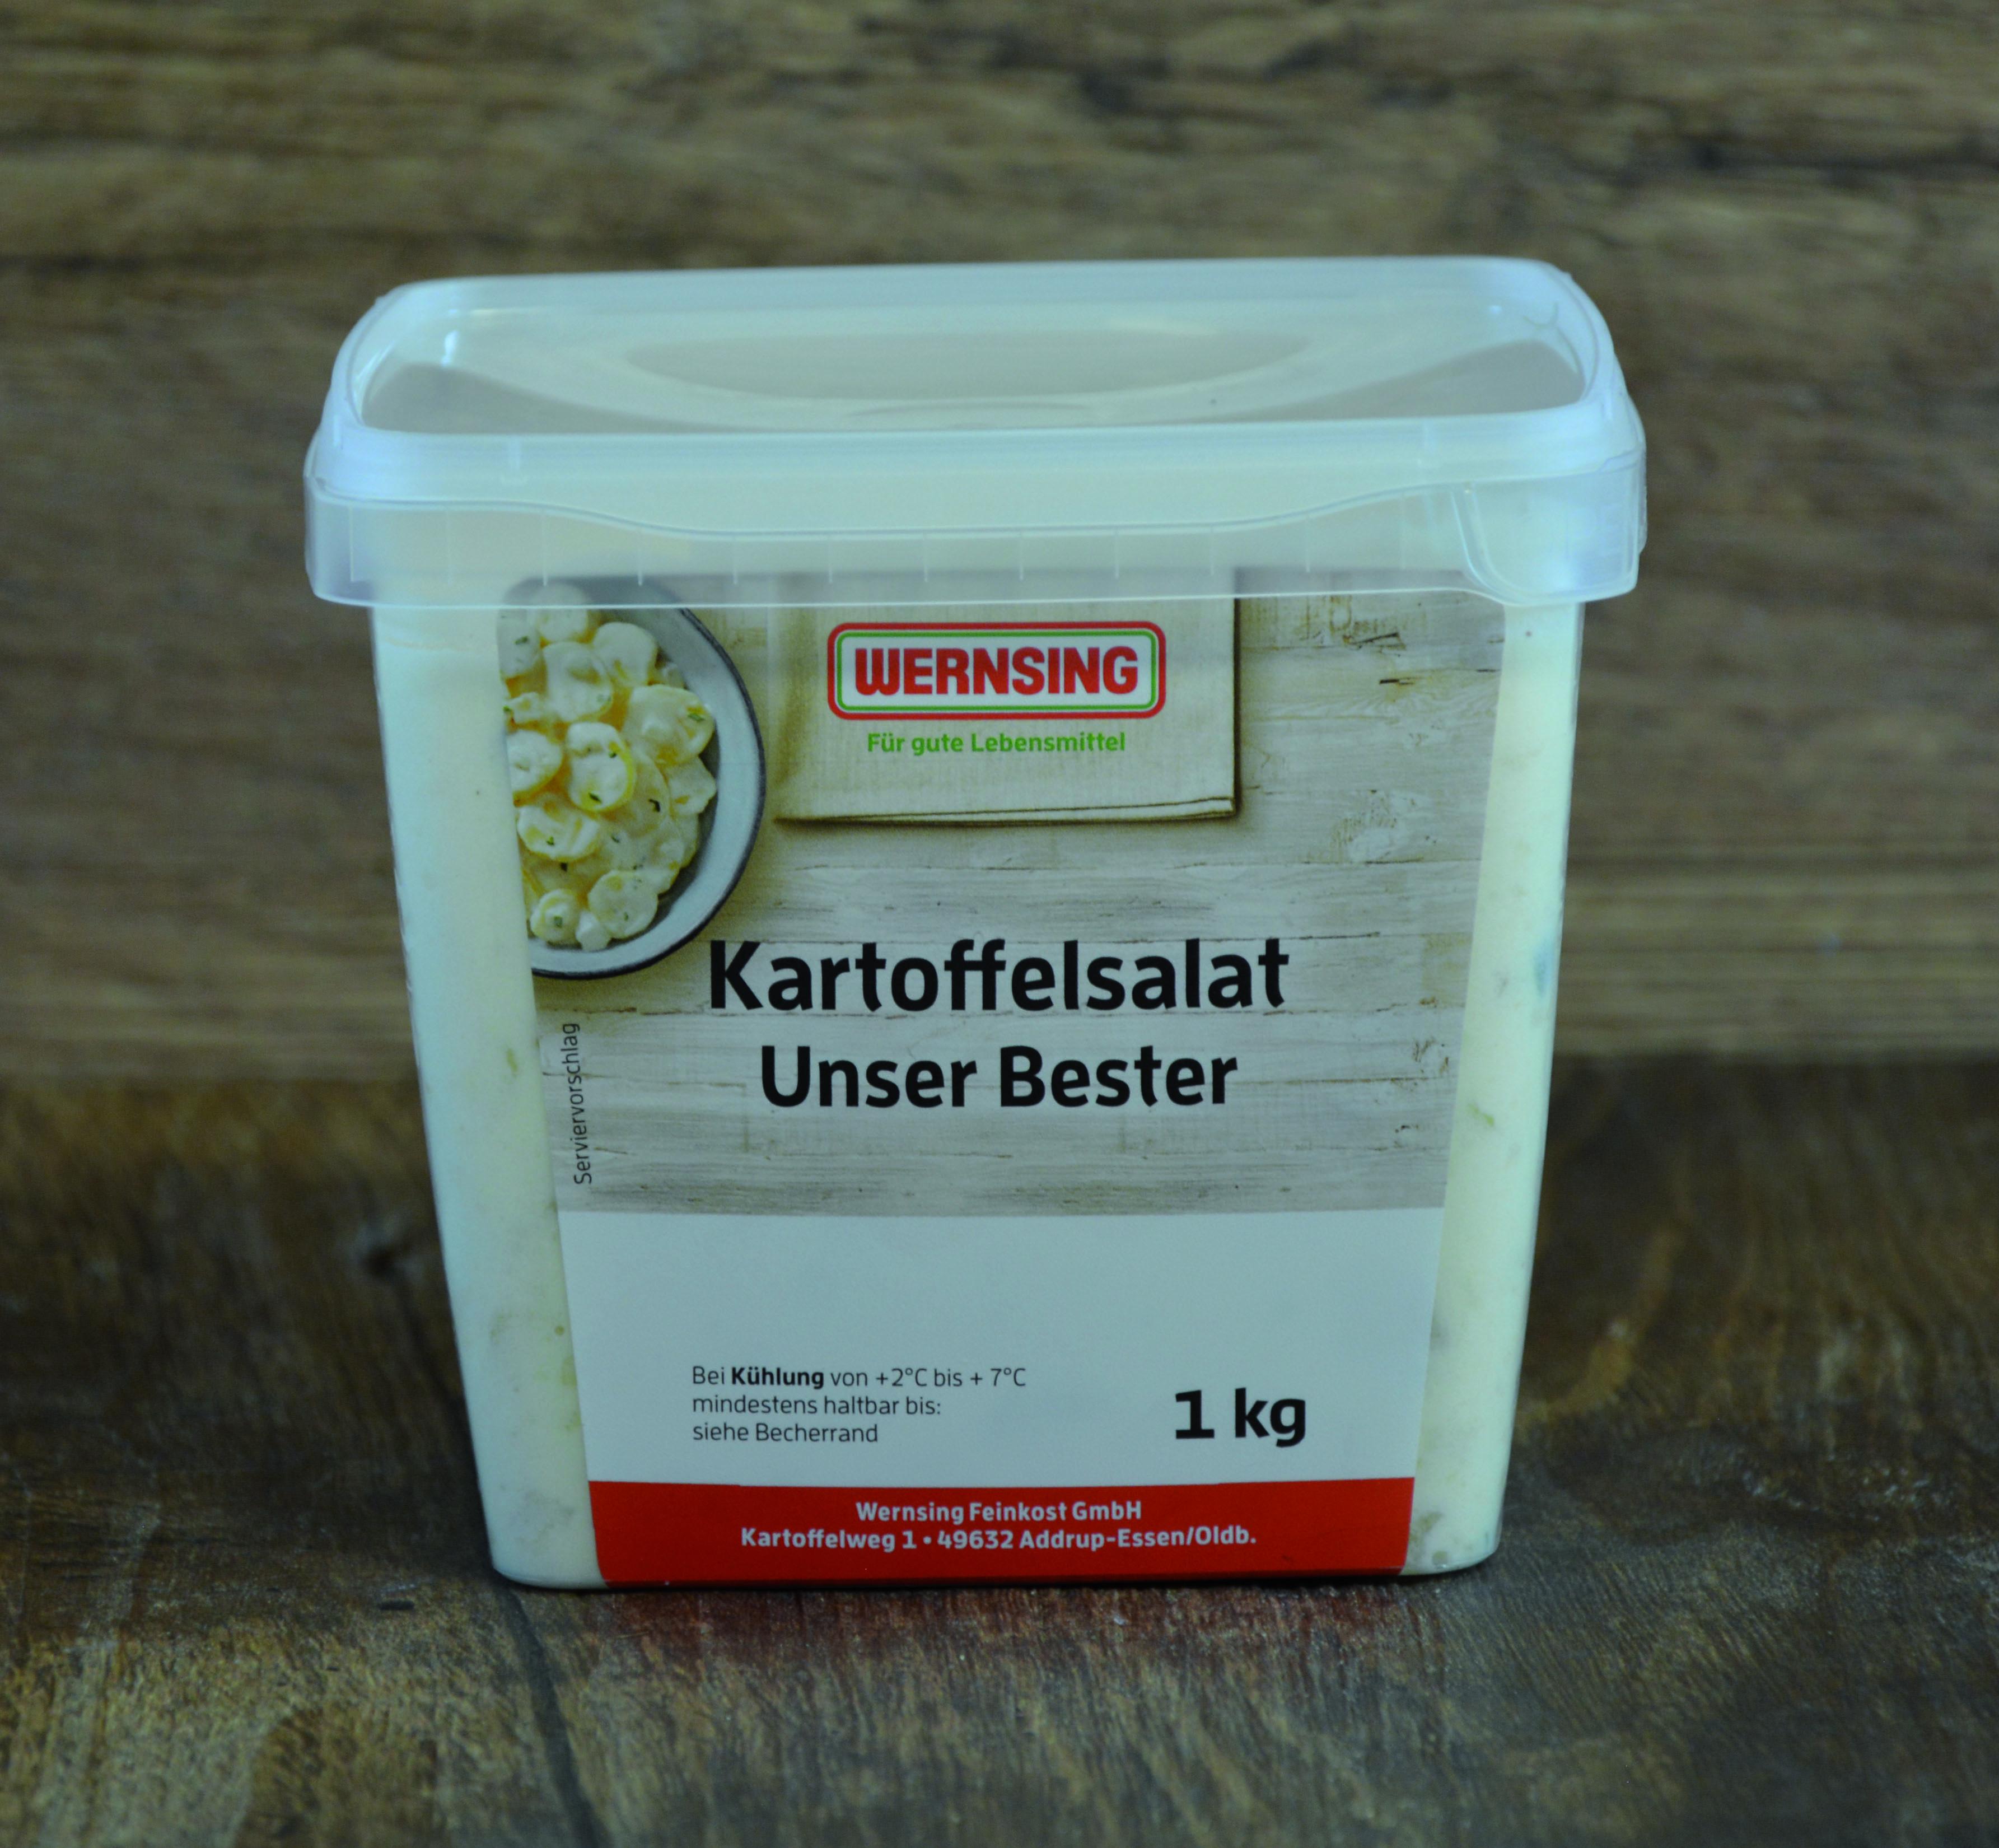 Wernsing Kartoffelsalat Unser Bester 1000 g